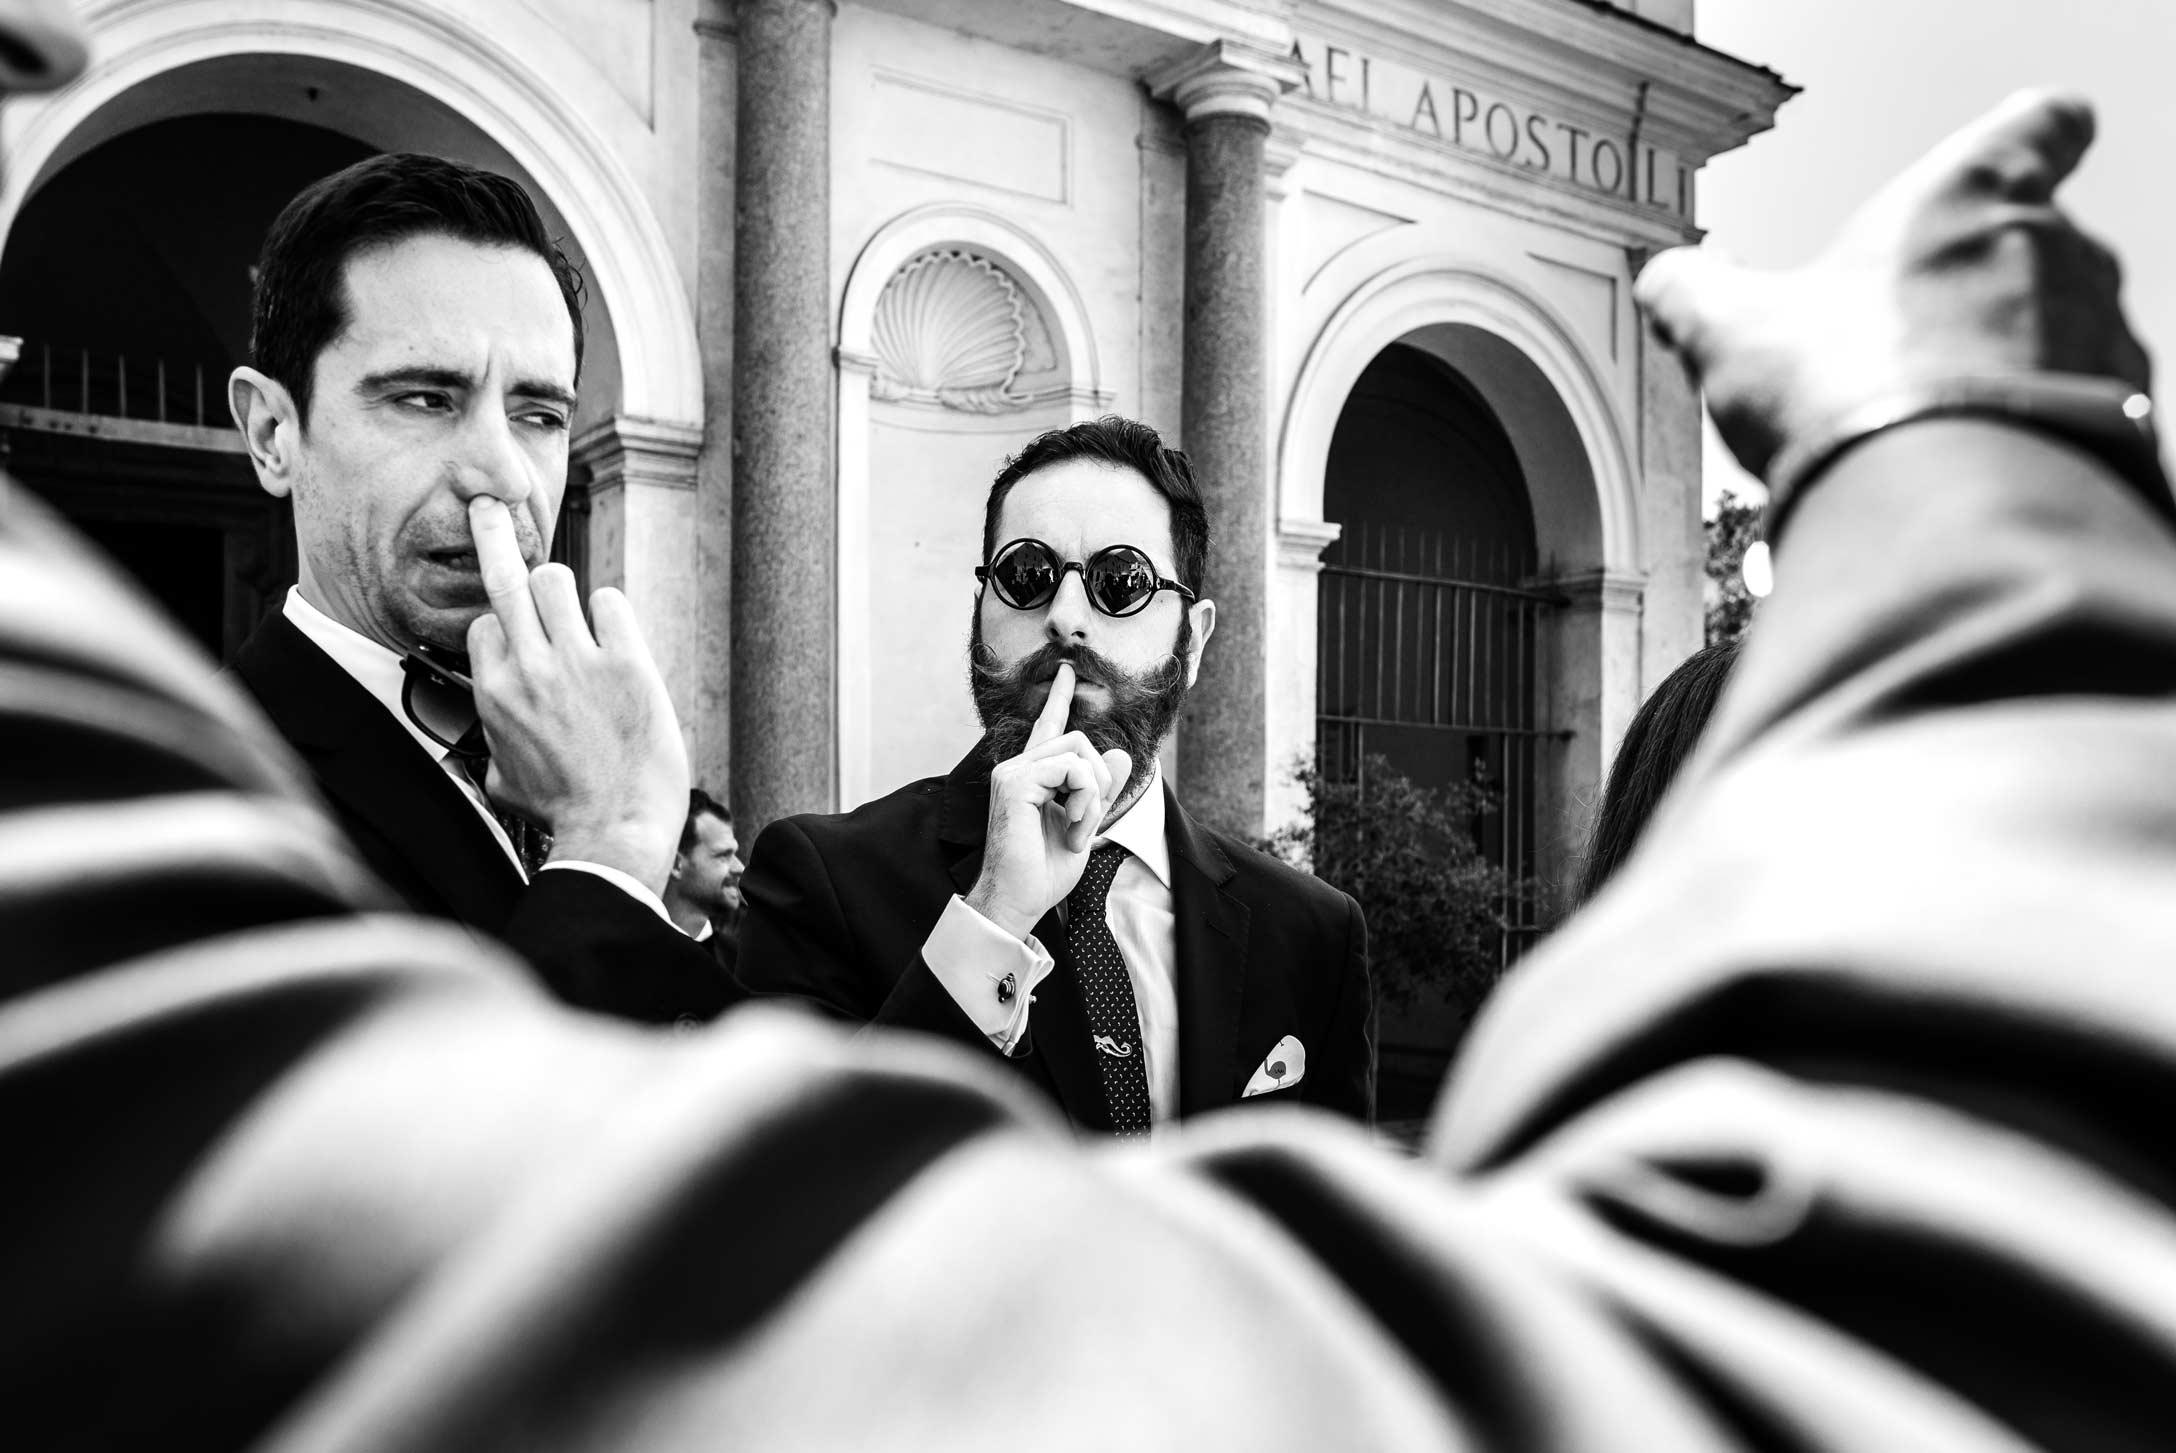 Destination-Wedding-Italy-Wedding-Photographer-in-Italy-1-Ceremony